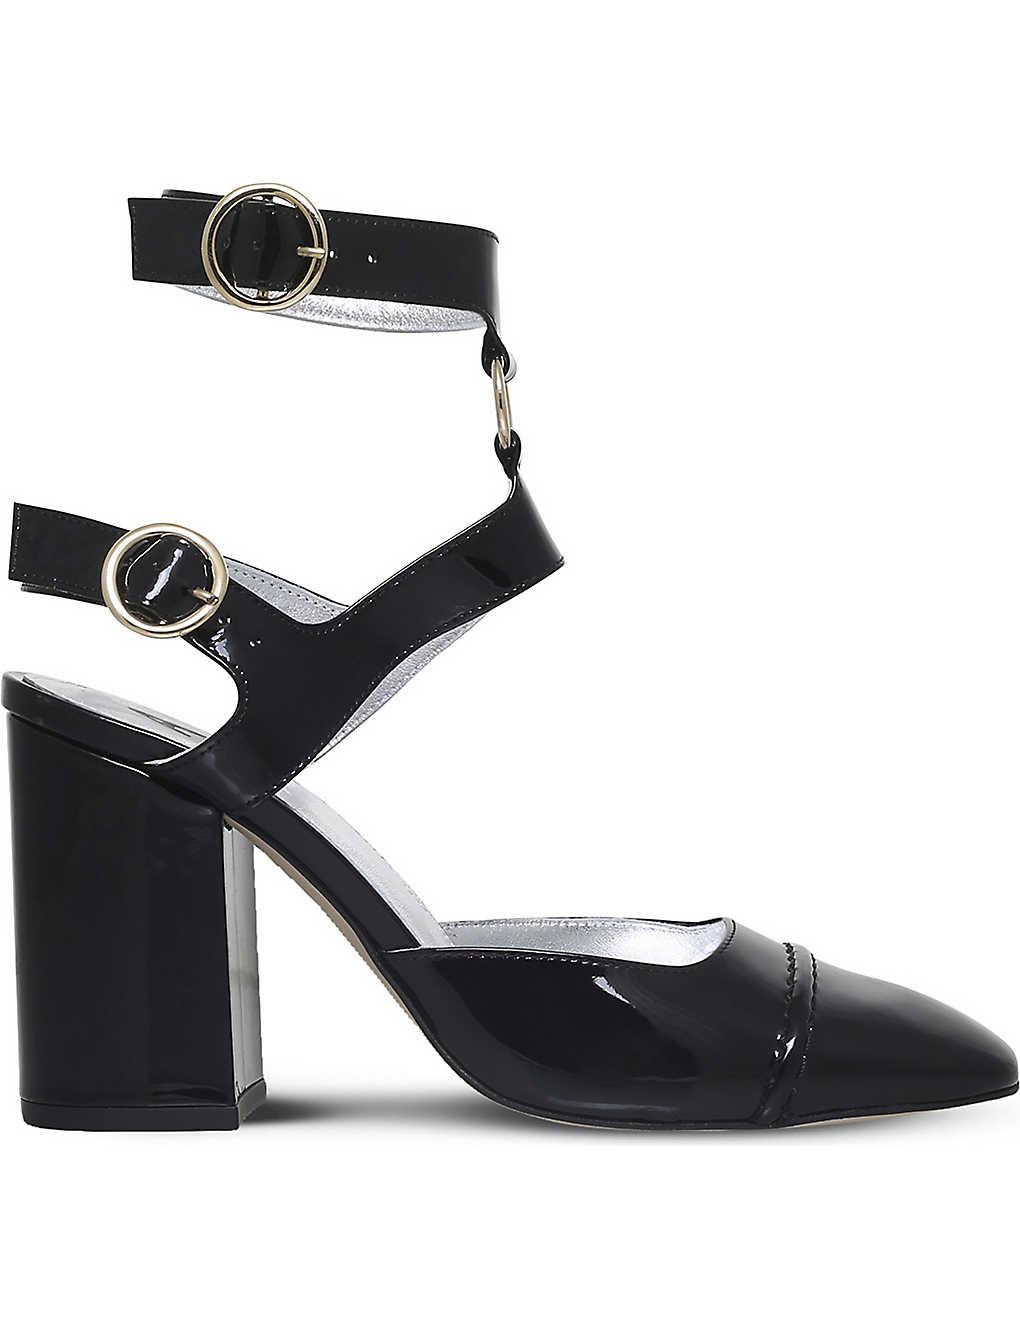 1acea1e83a ALEXA CHUNG - Ankle-strap patent-leather heeled pumps   Selfridges.com